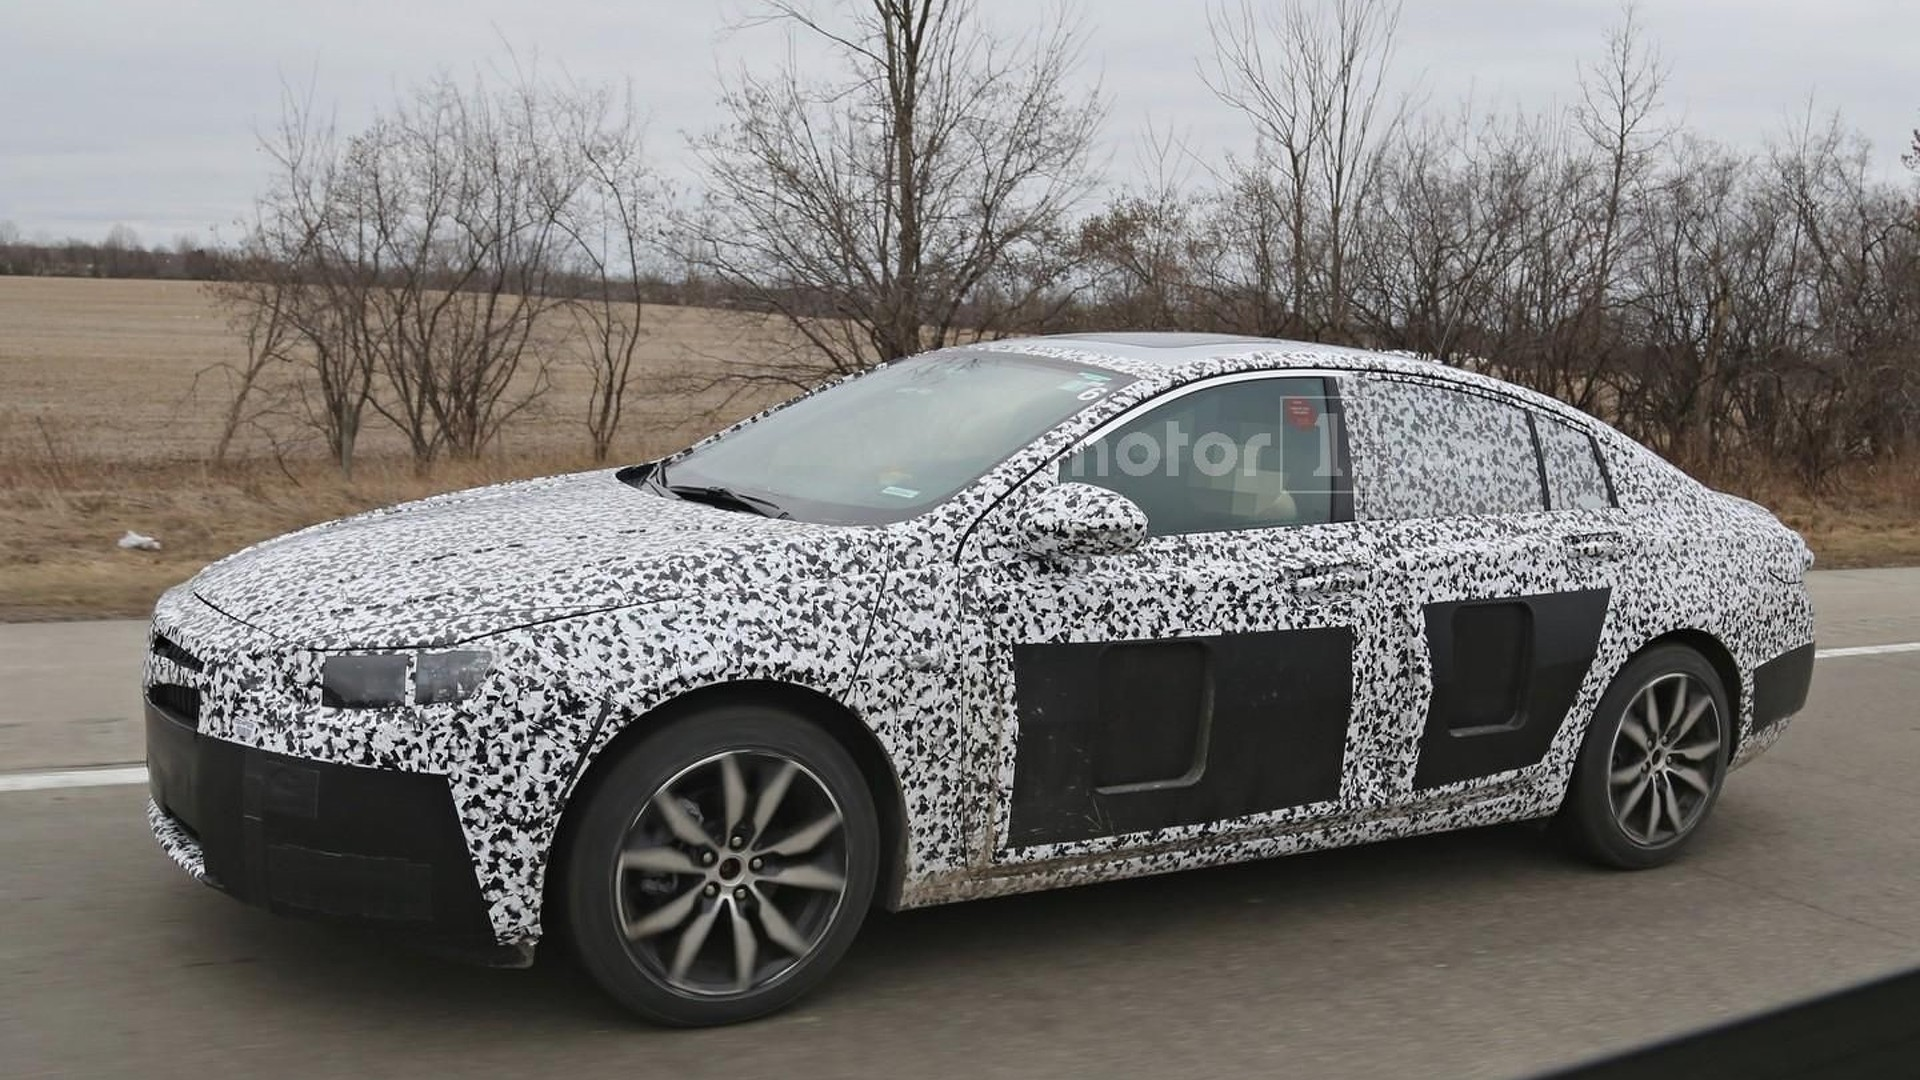 2018 Buick Regal wagon announced at dealer meeting